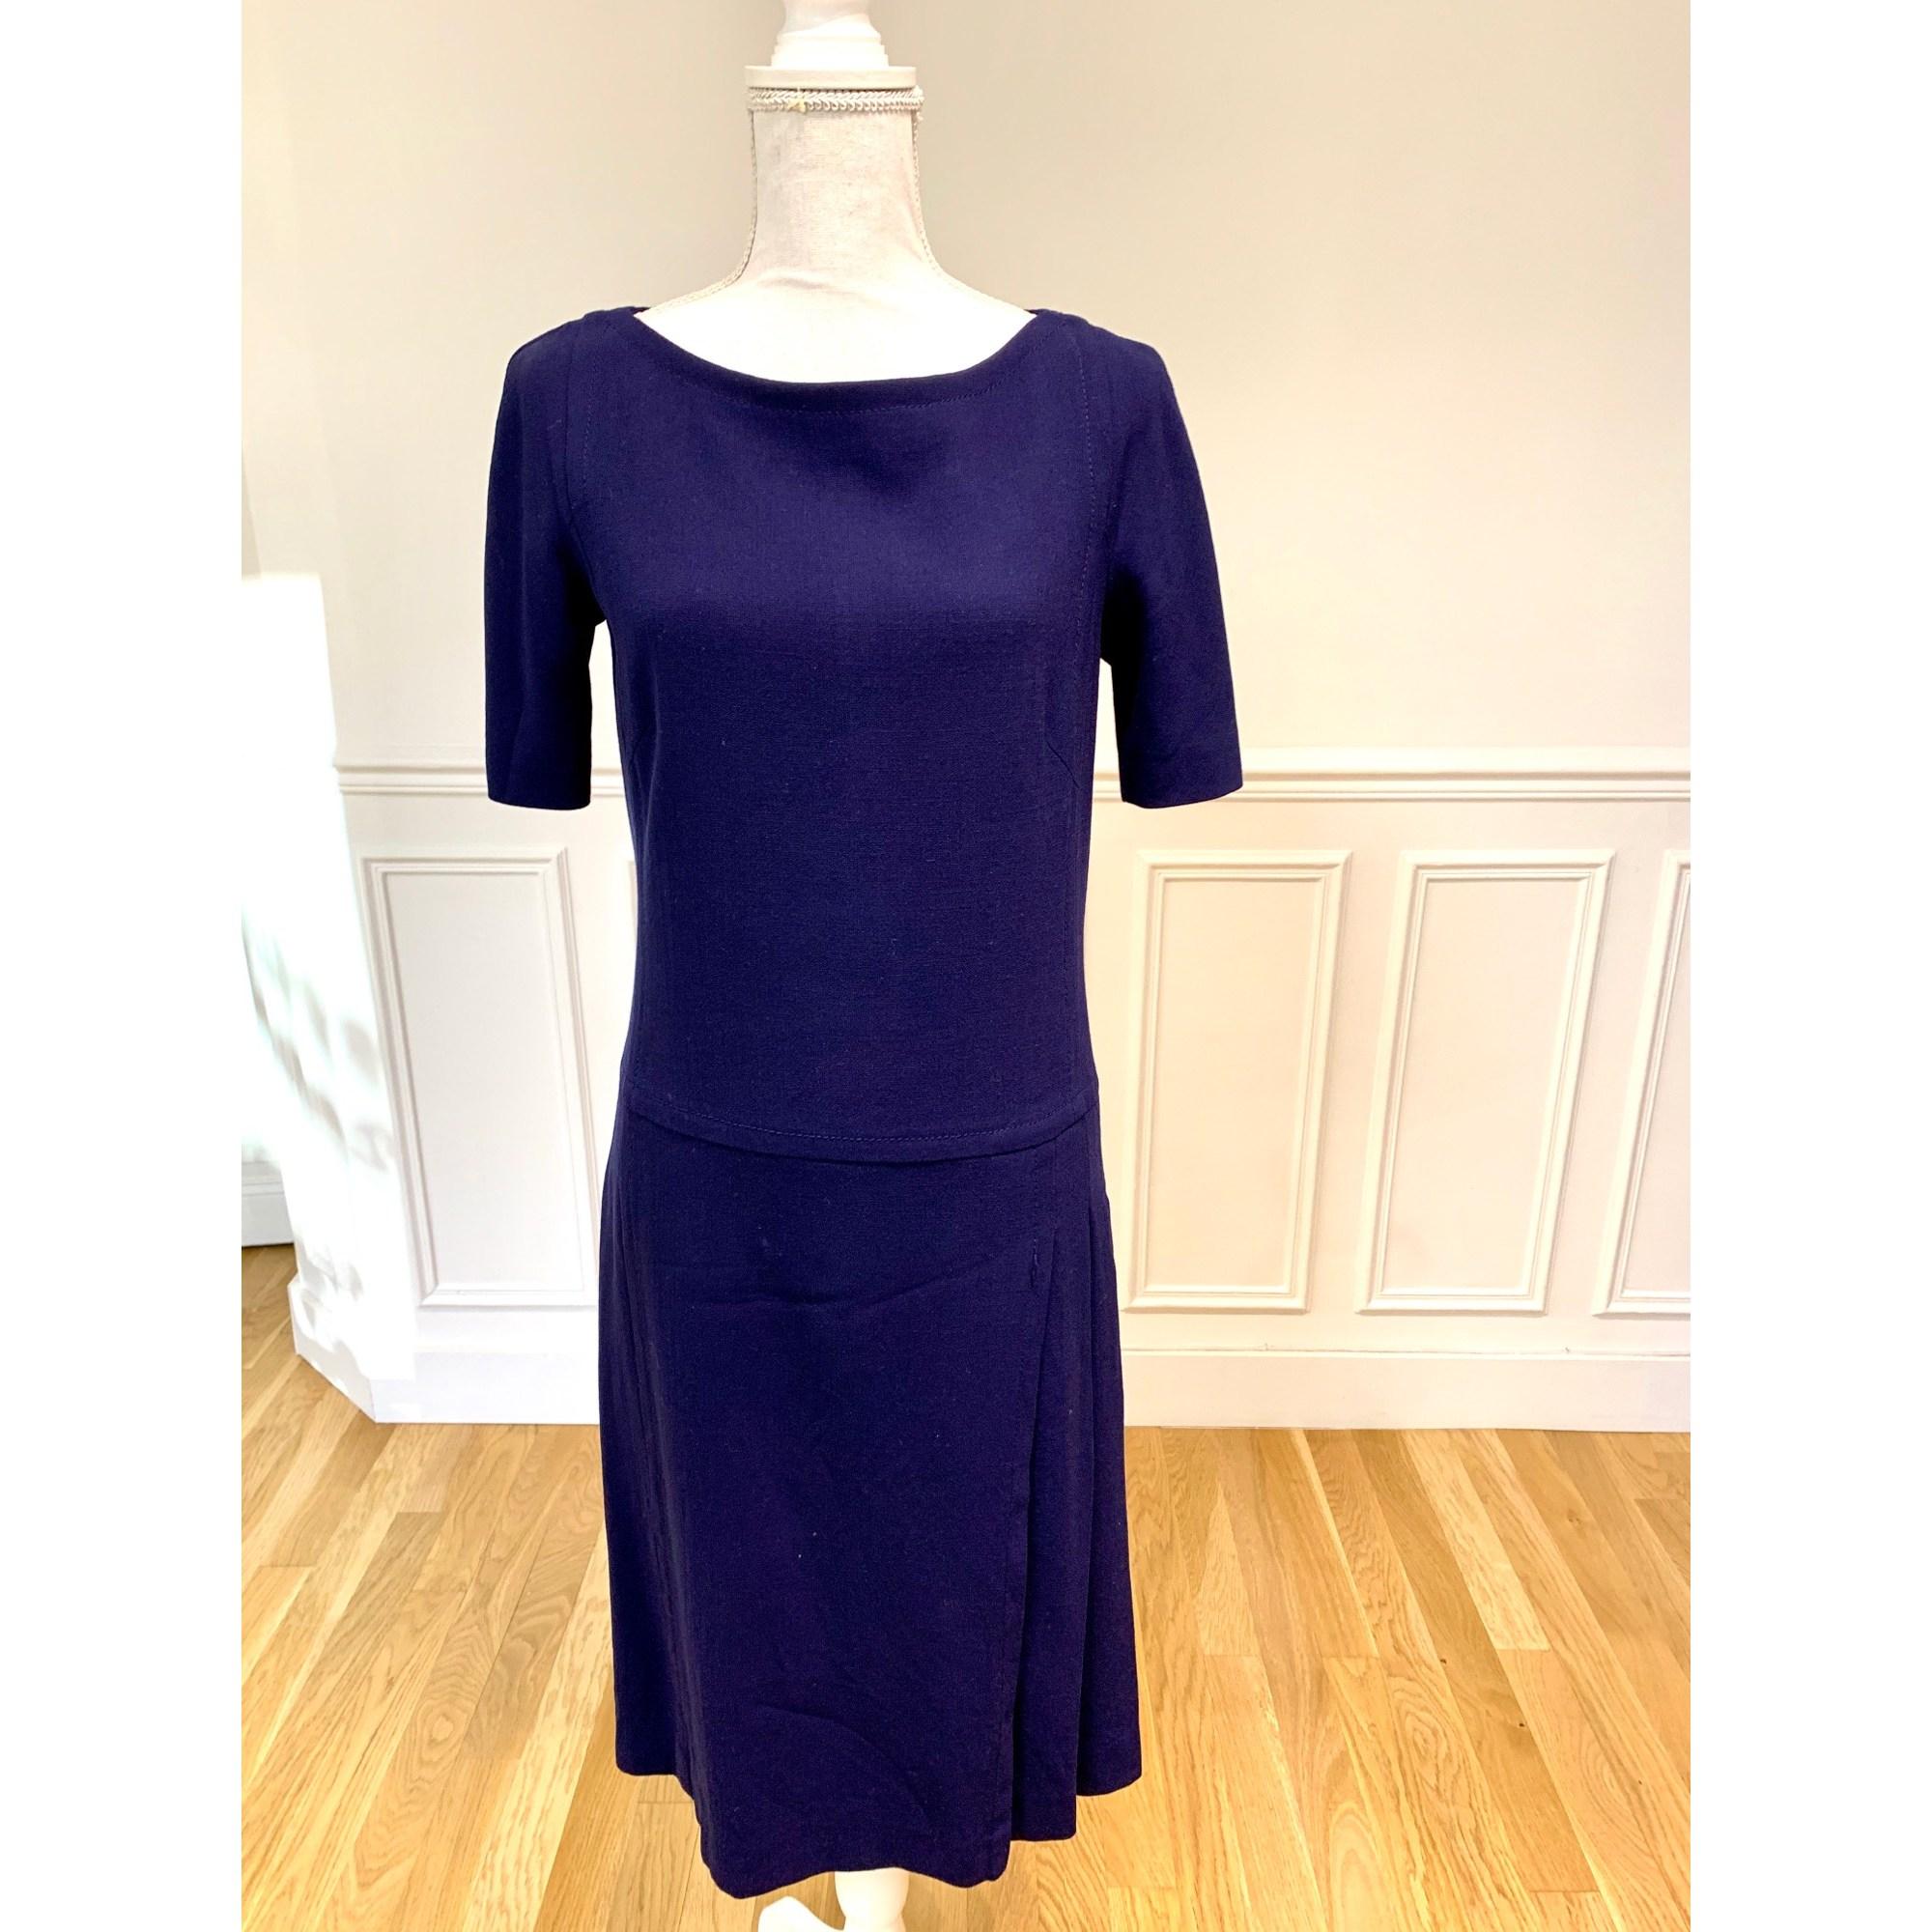 Robe mi-longue MARQUE INCONNUE Bleu, bleu marine, bleu turquoise